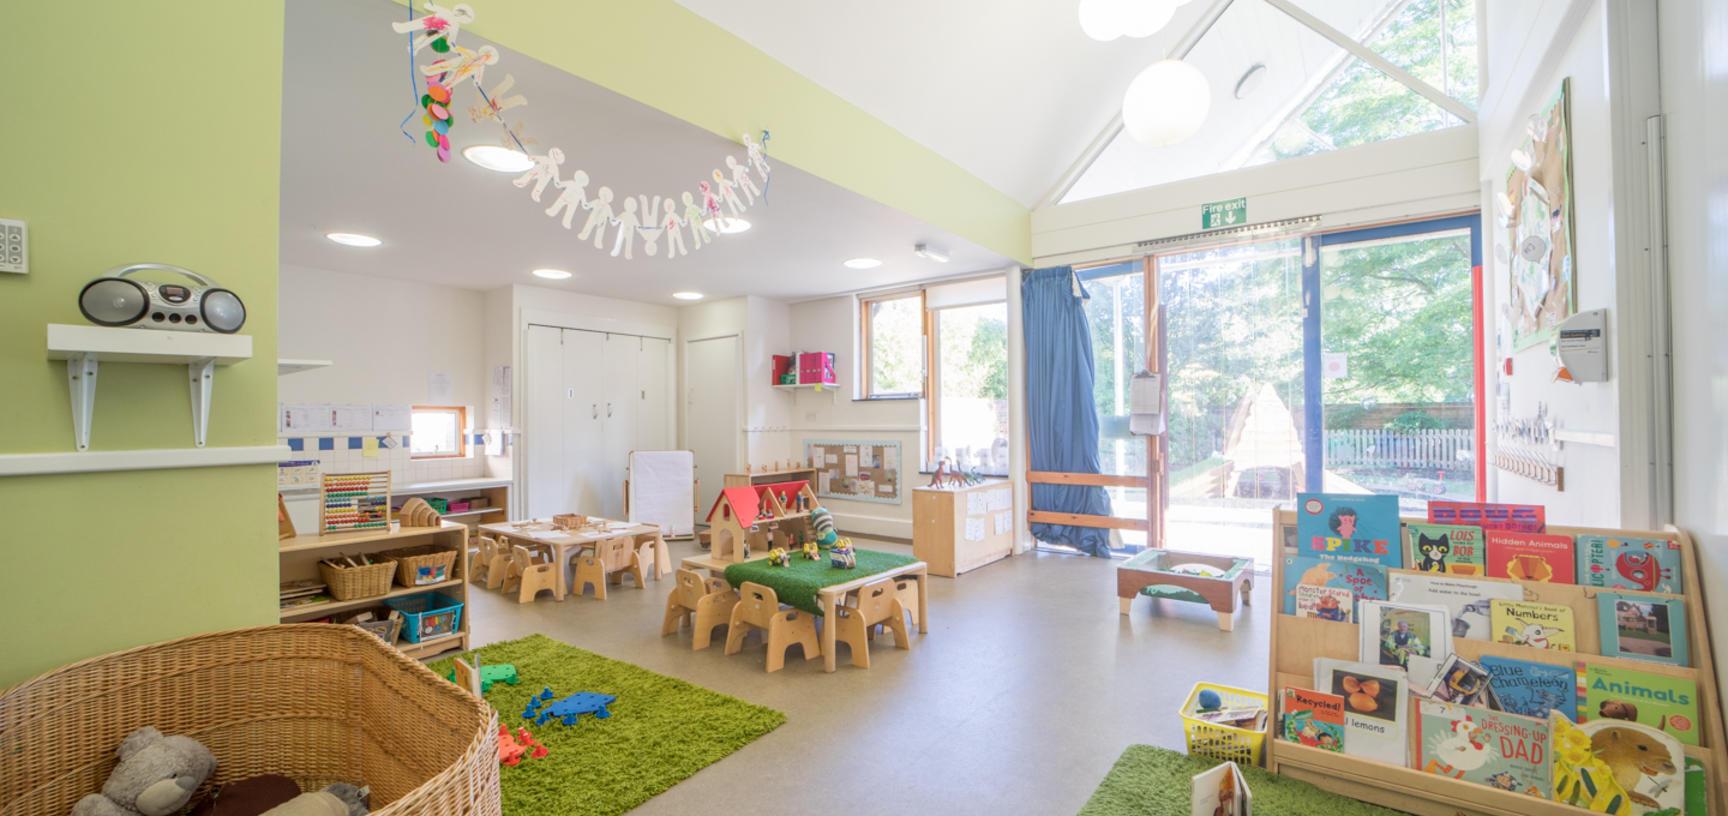 bradmore road toddler room 1